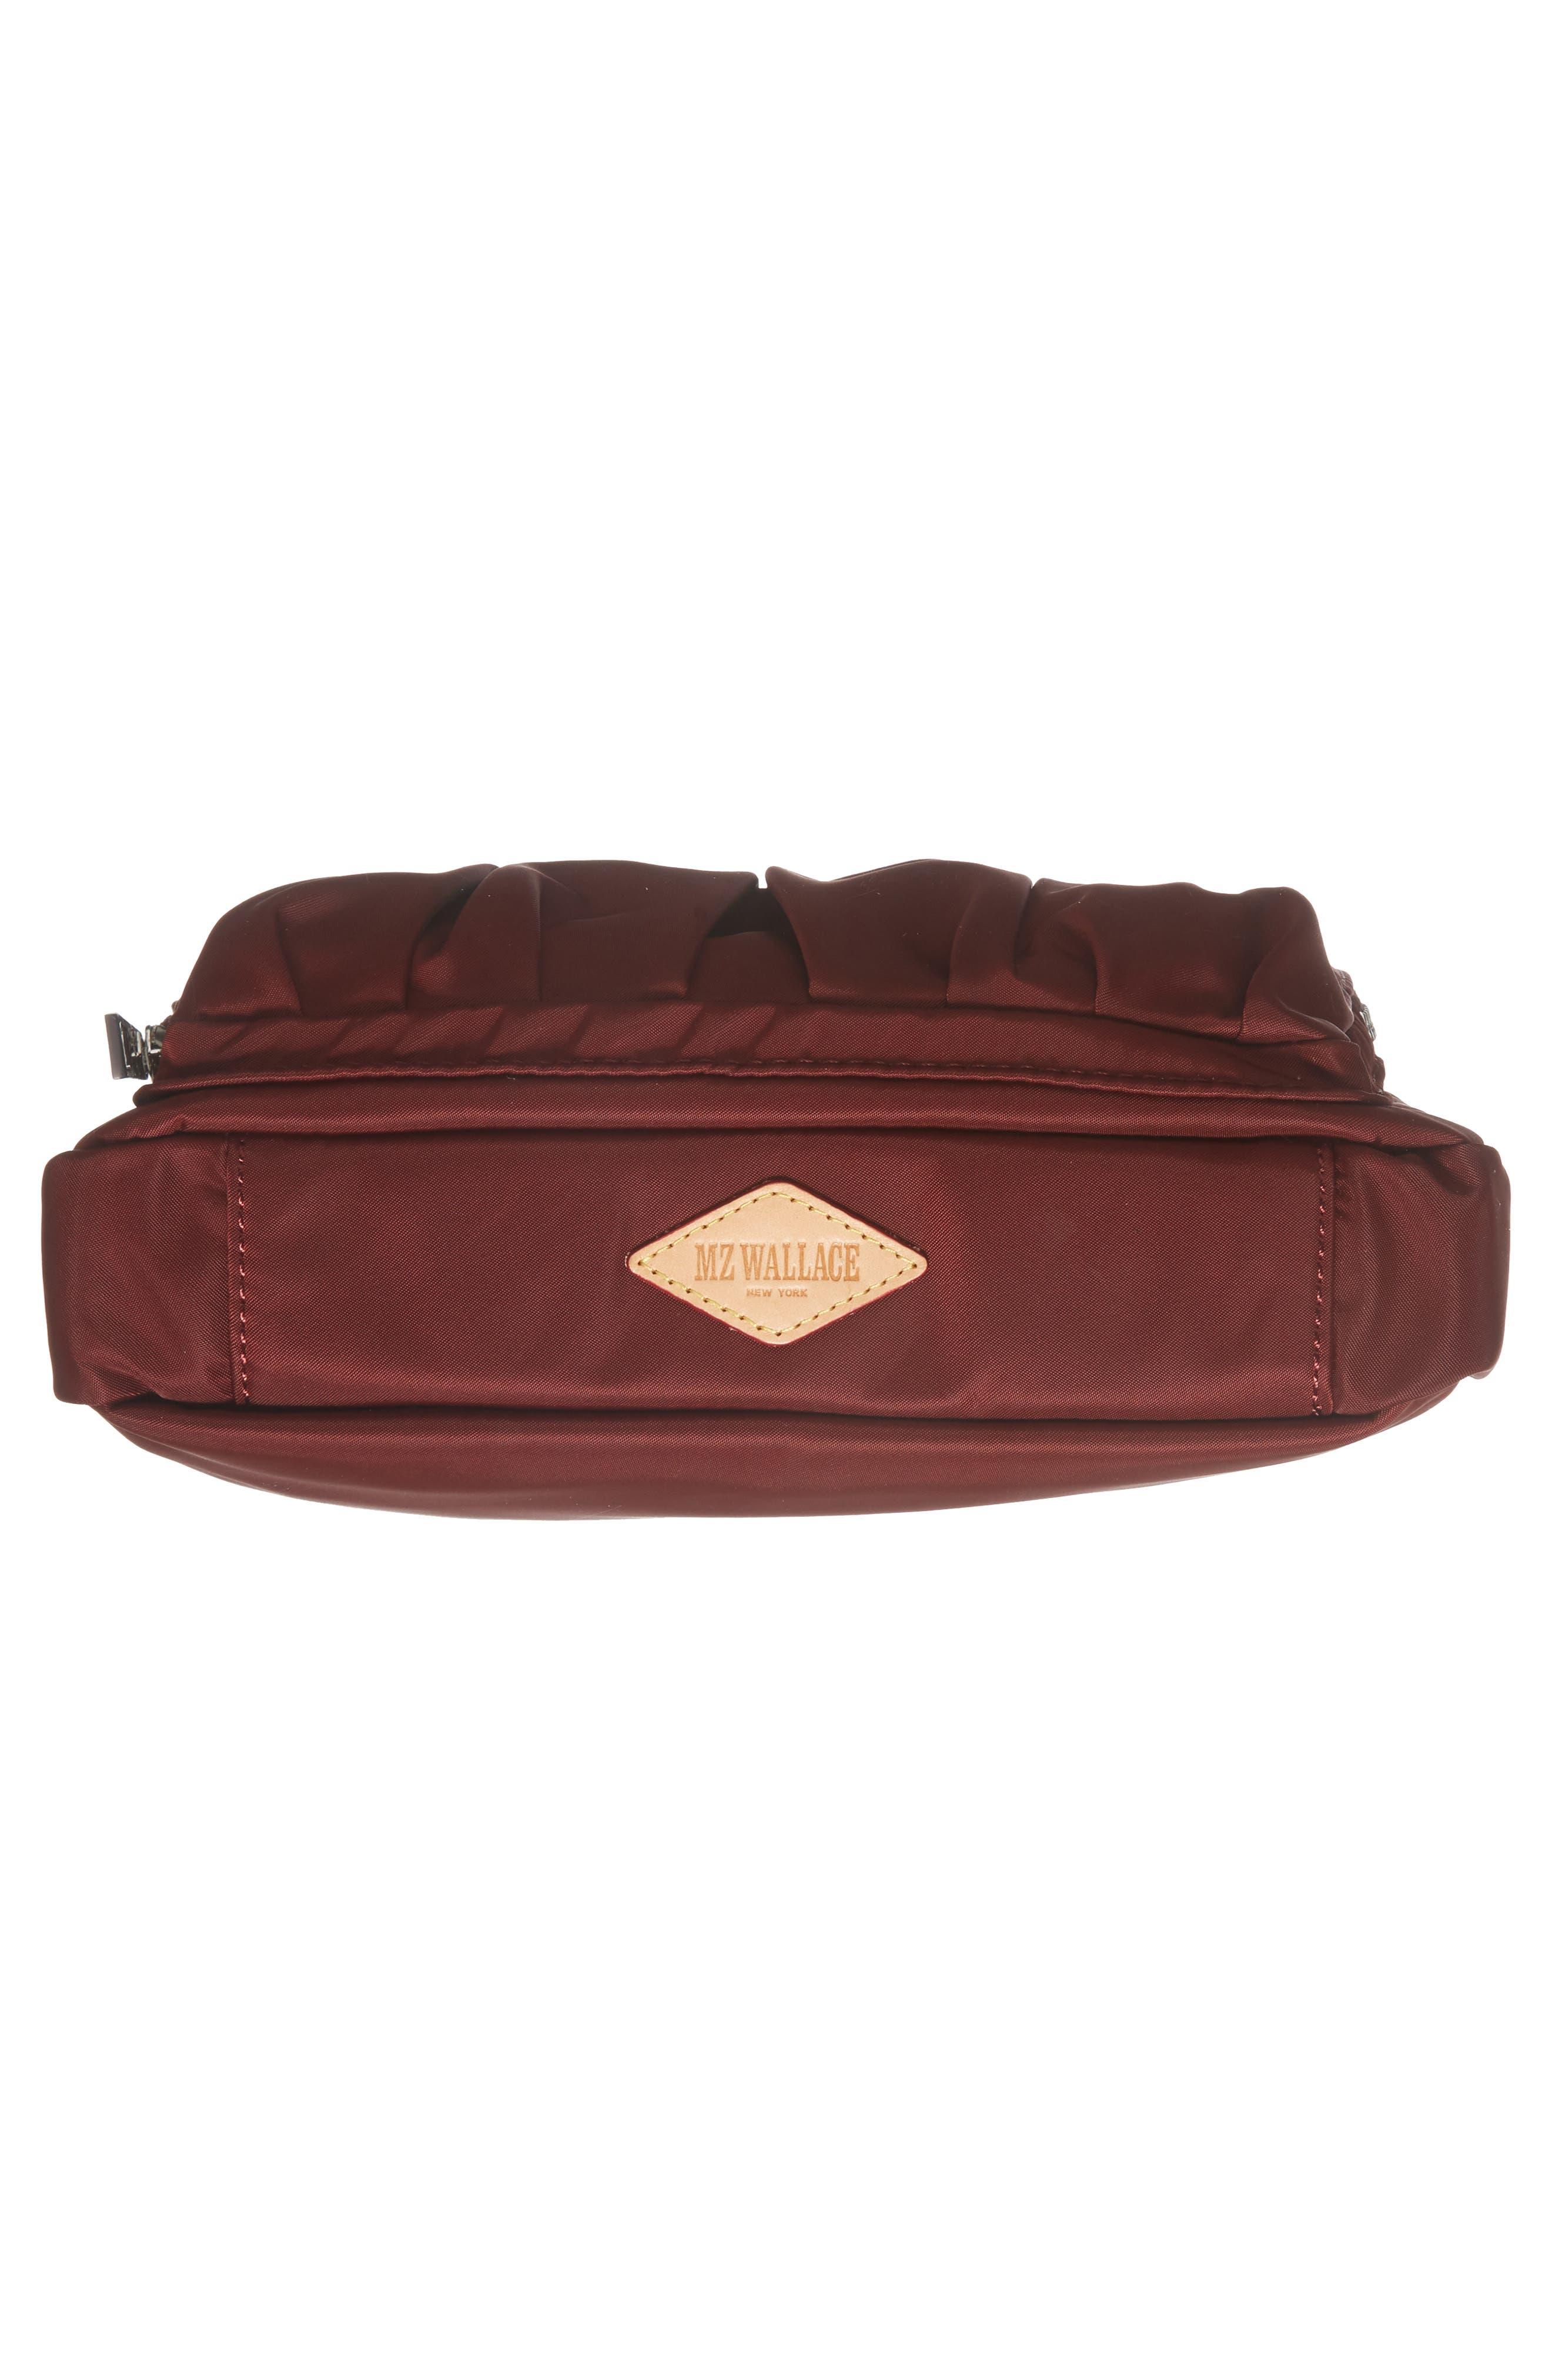 Abbey Bedford Nylon Crossbody Bag,                             Alternate thumbnail 6, color,                             618